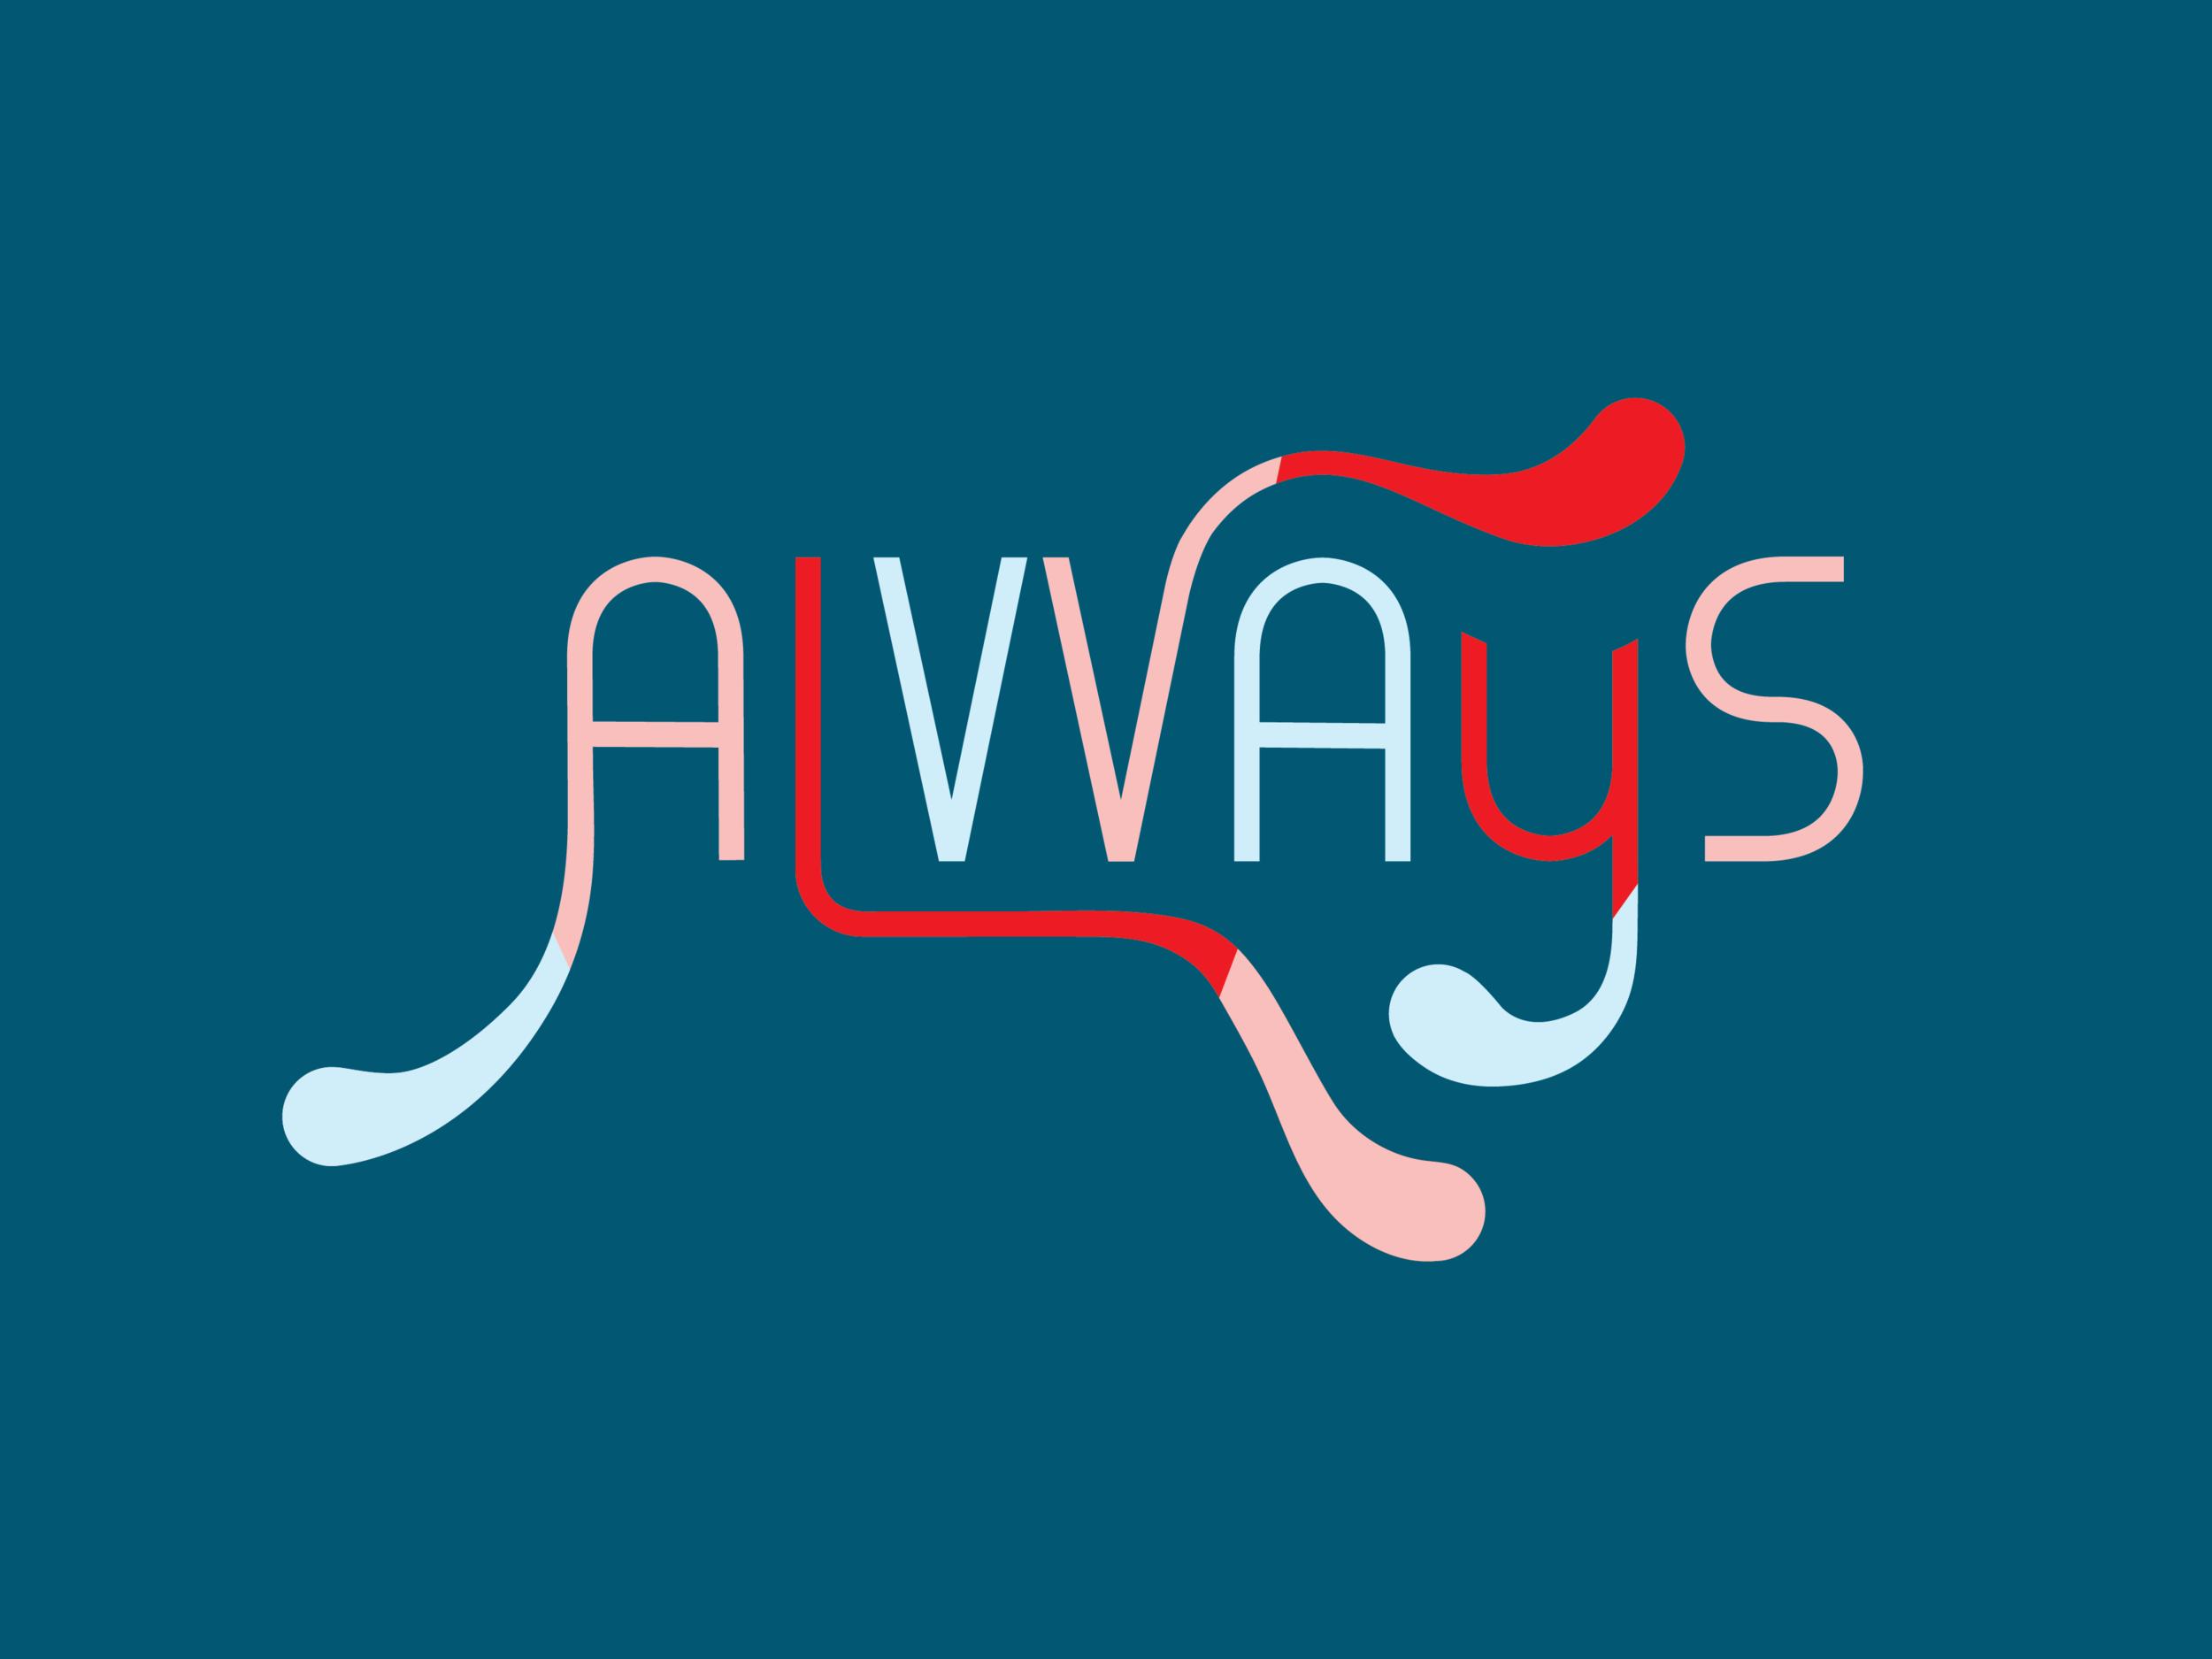 Alvvays-10.png